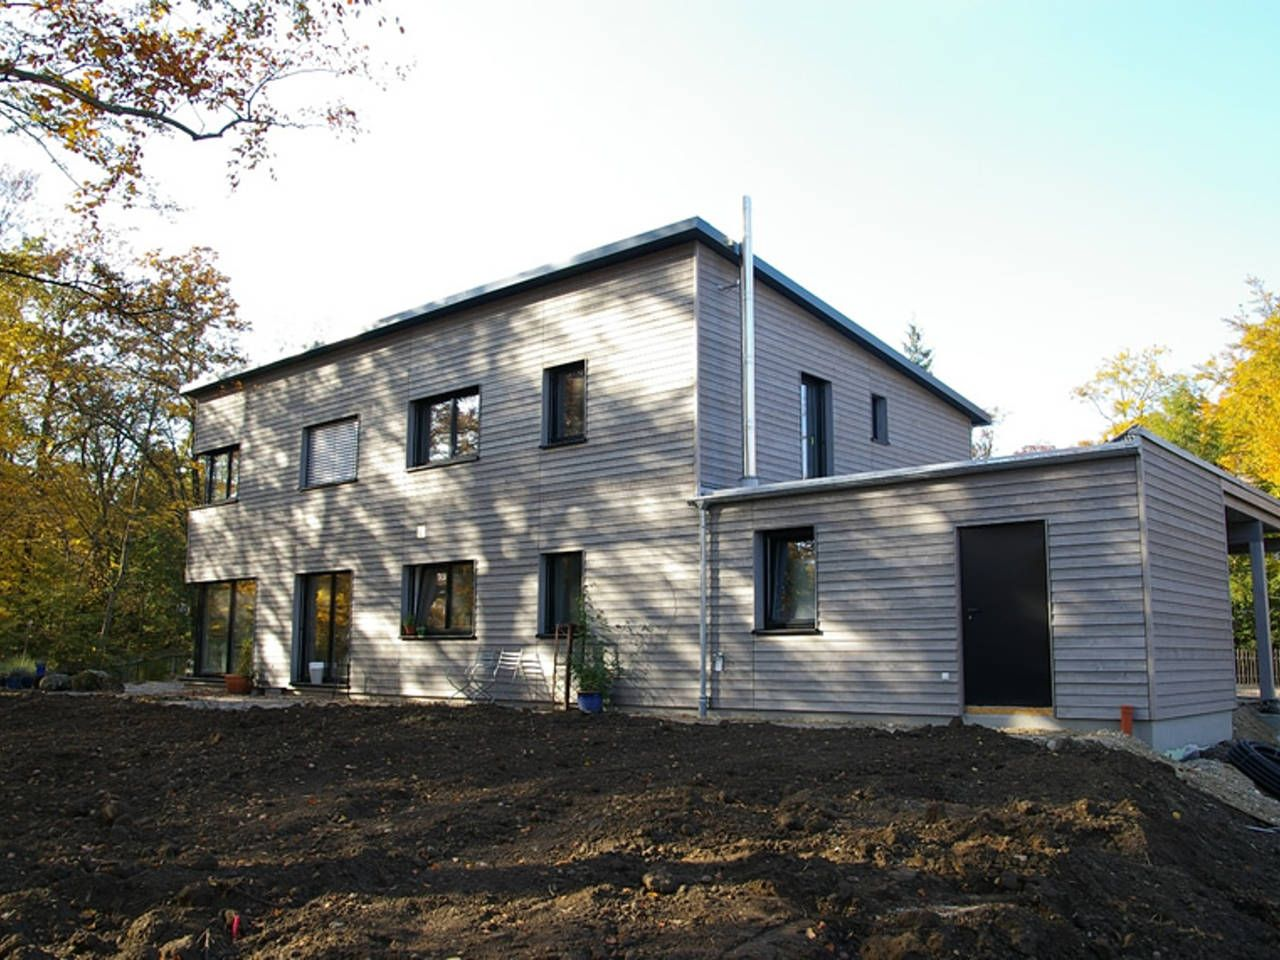 Rosskopf Holzhaus haus nimrod blockhaus holzhaus rosskopf großzügiges holzhaus